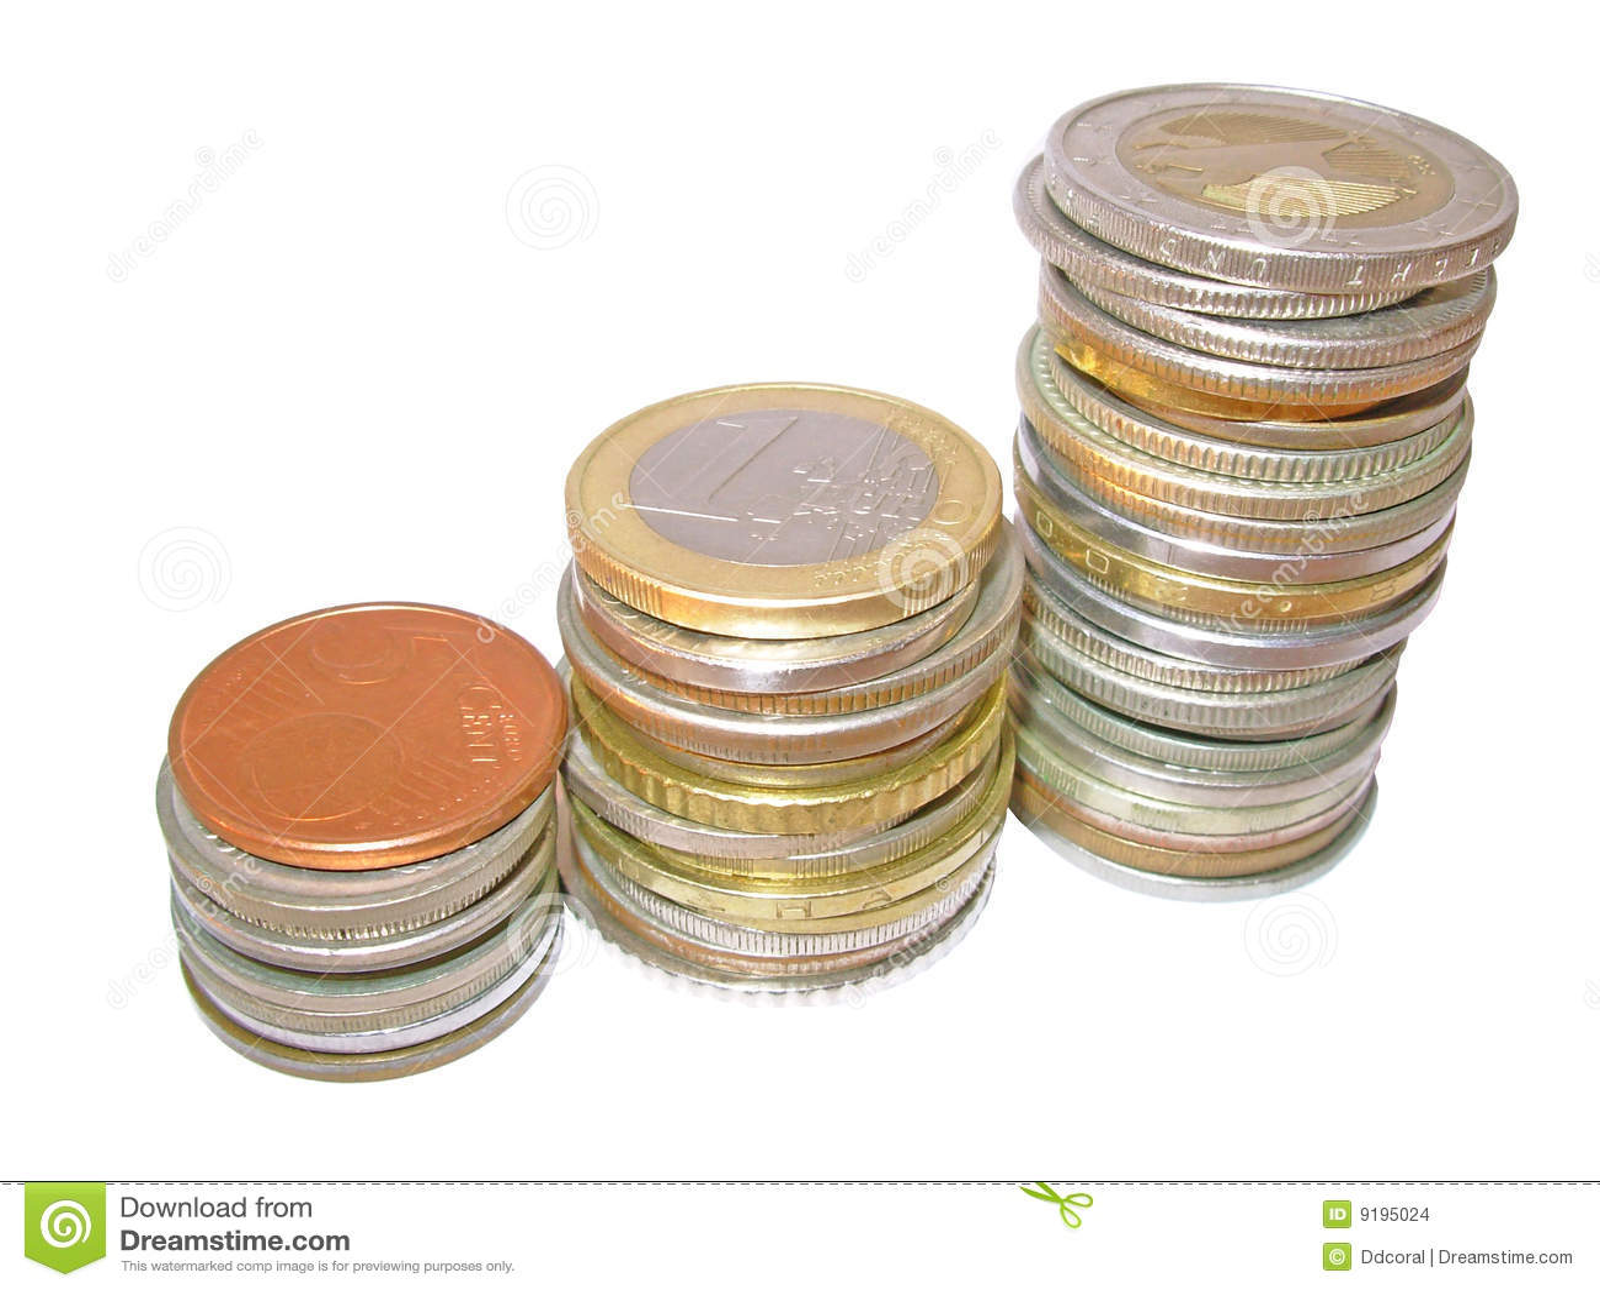 graph-growth-finances-accumulation-9195024.jpg